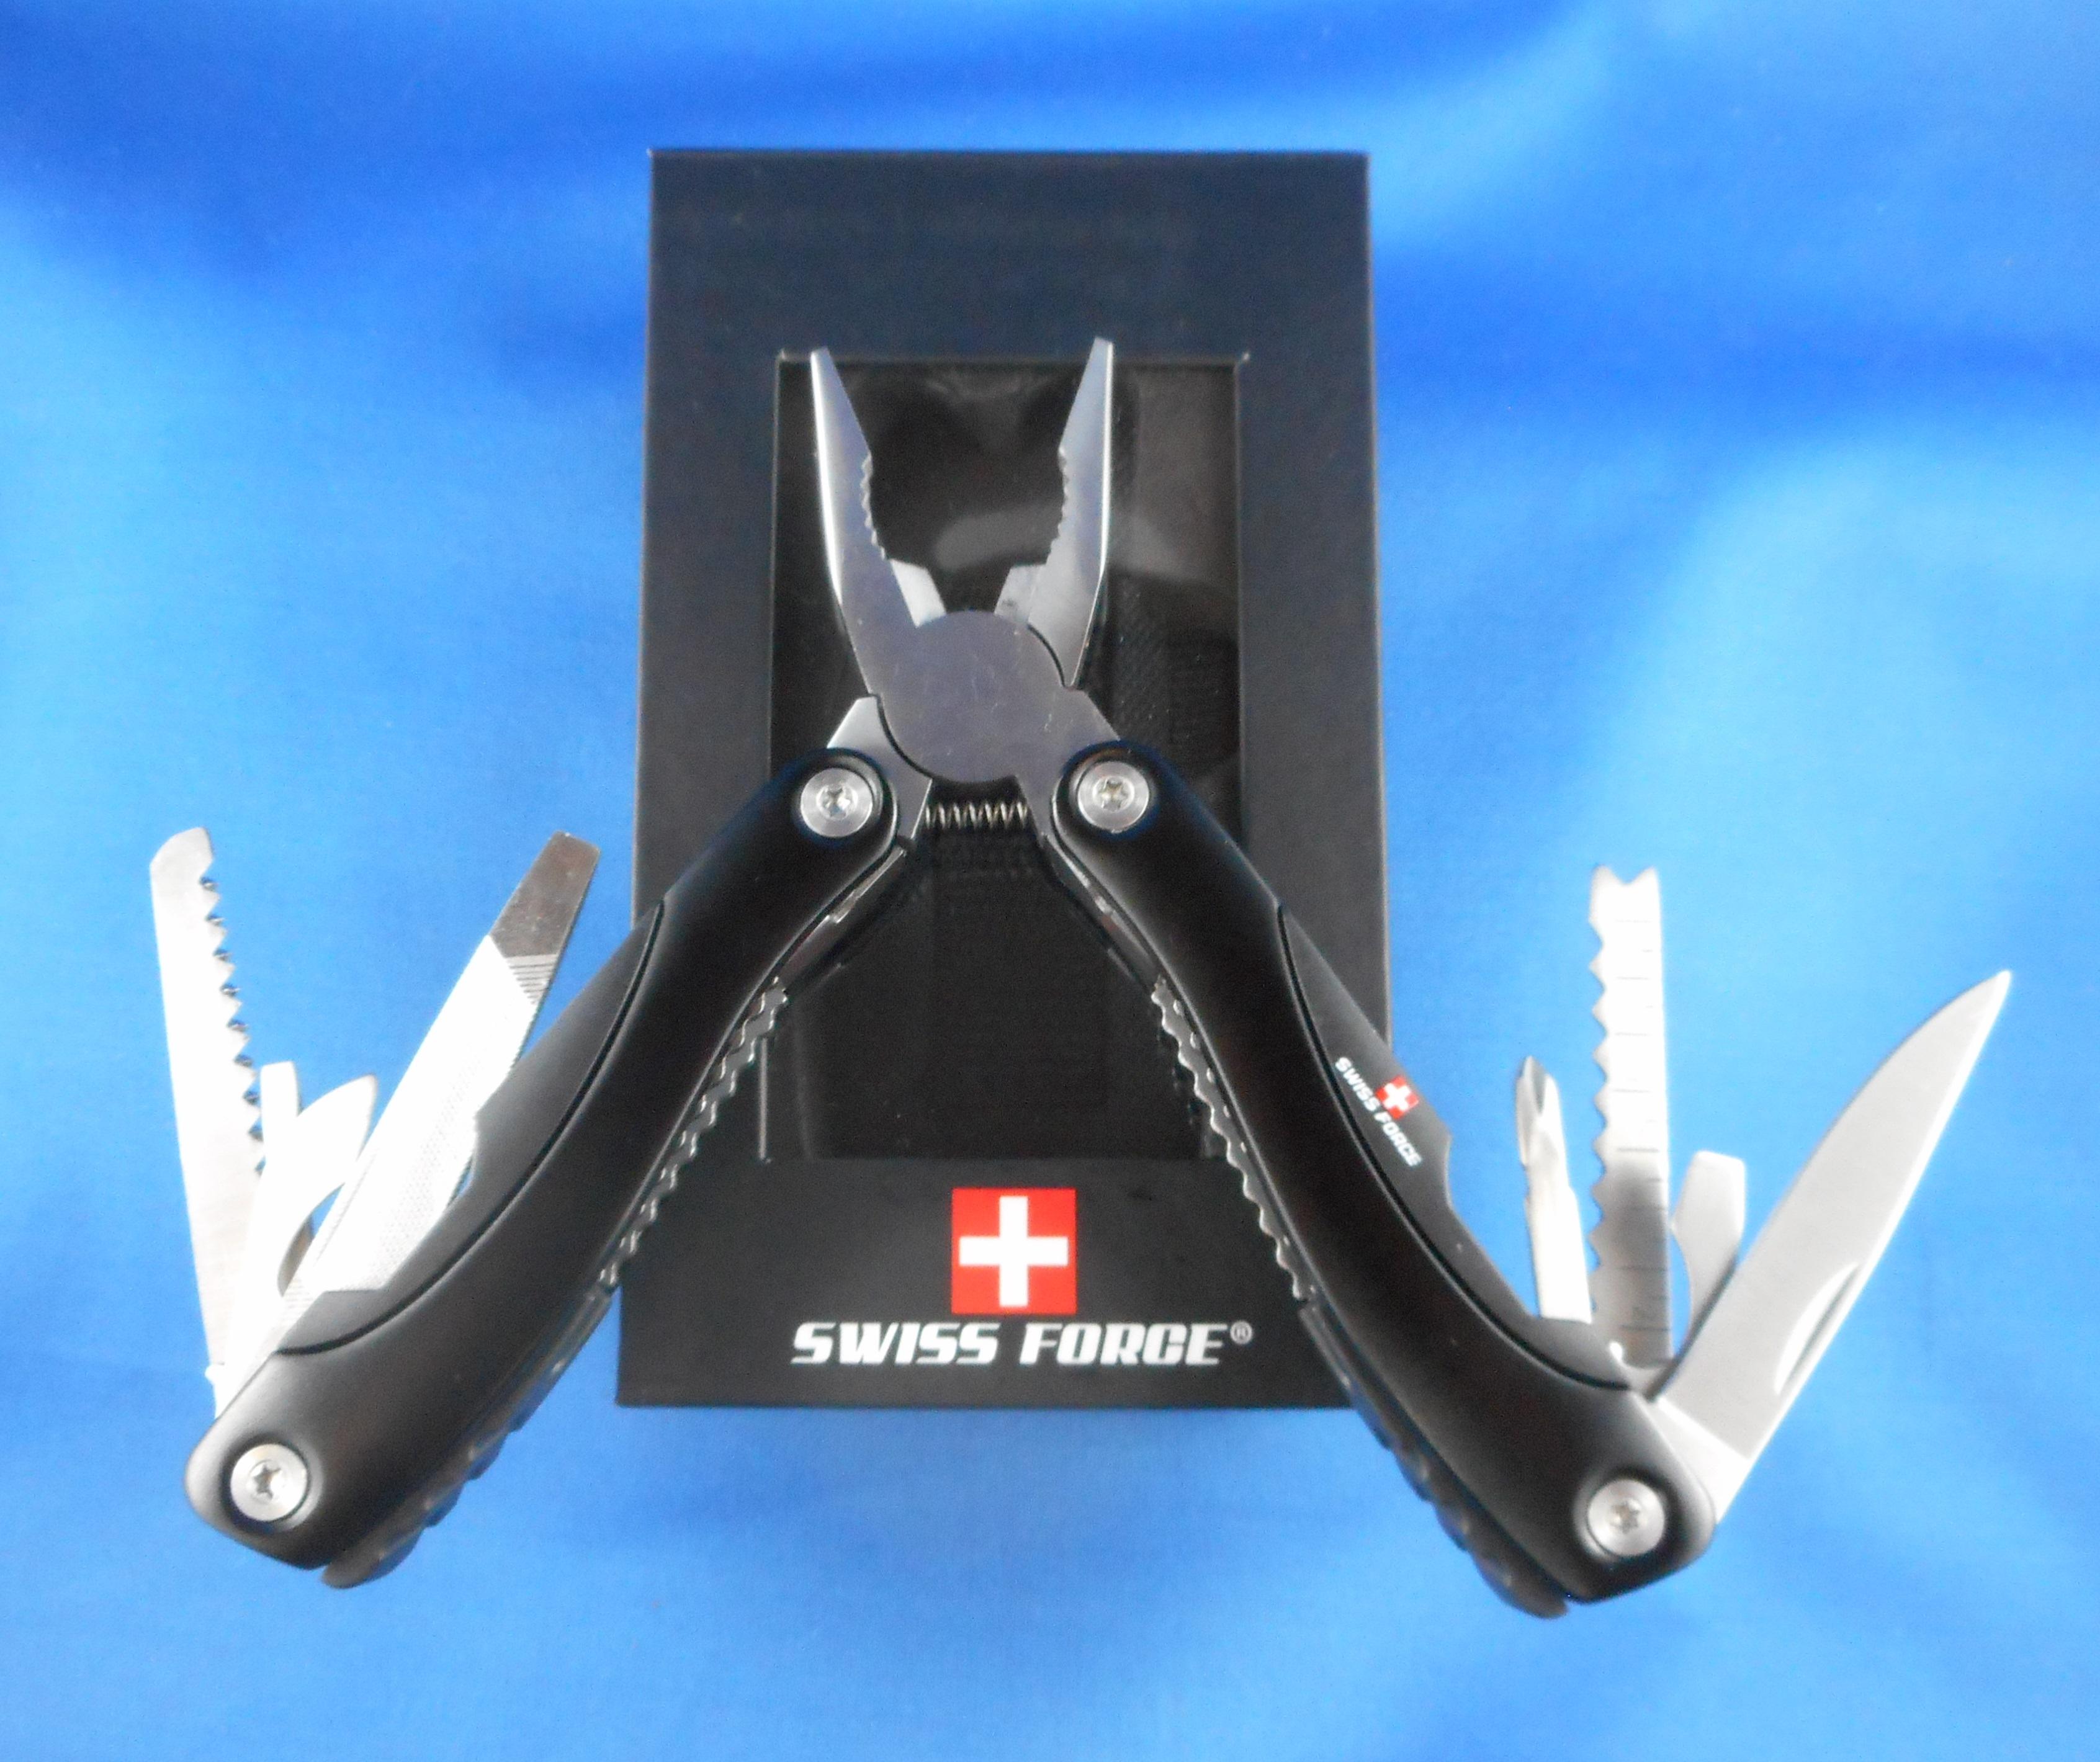 Swiss Force multi-tool